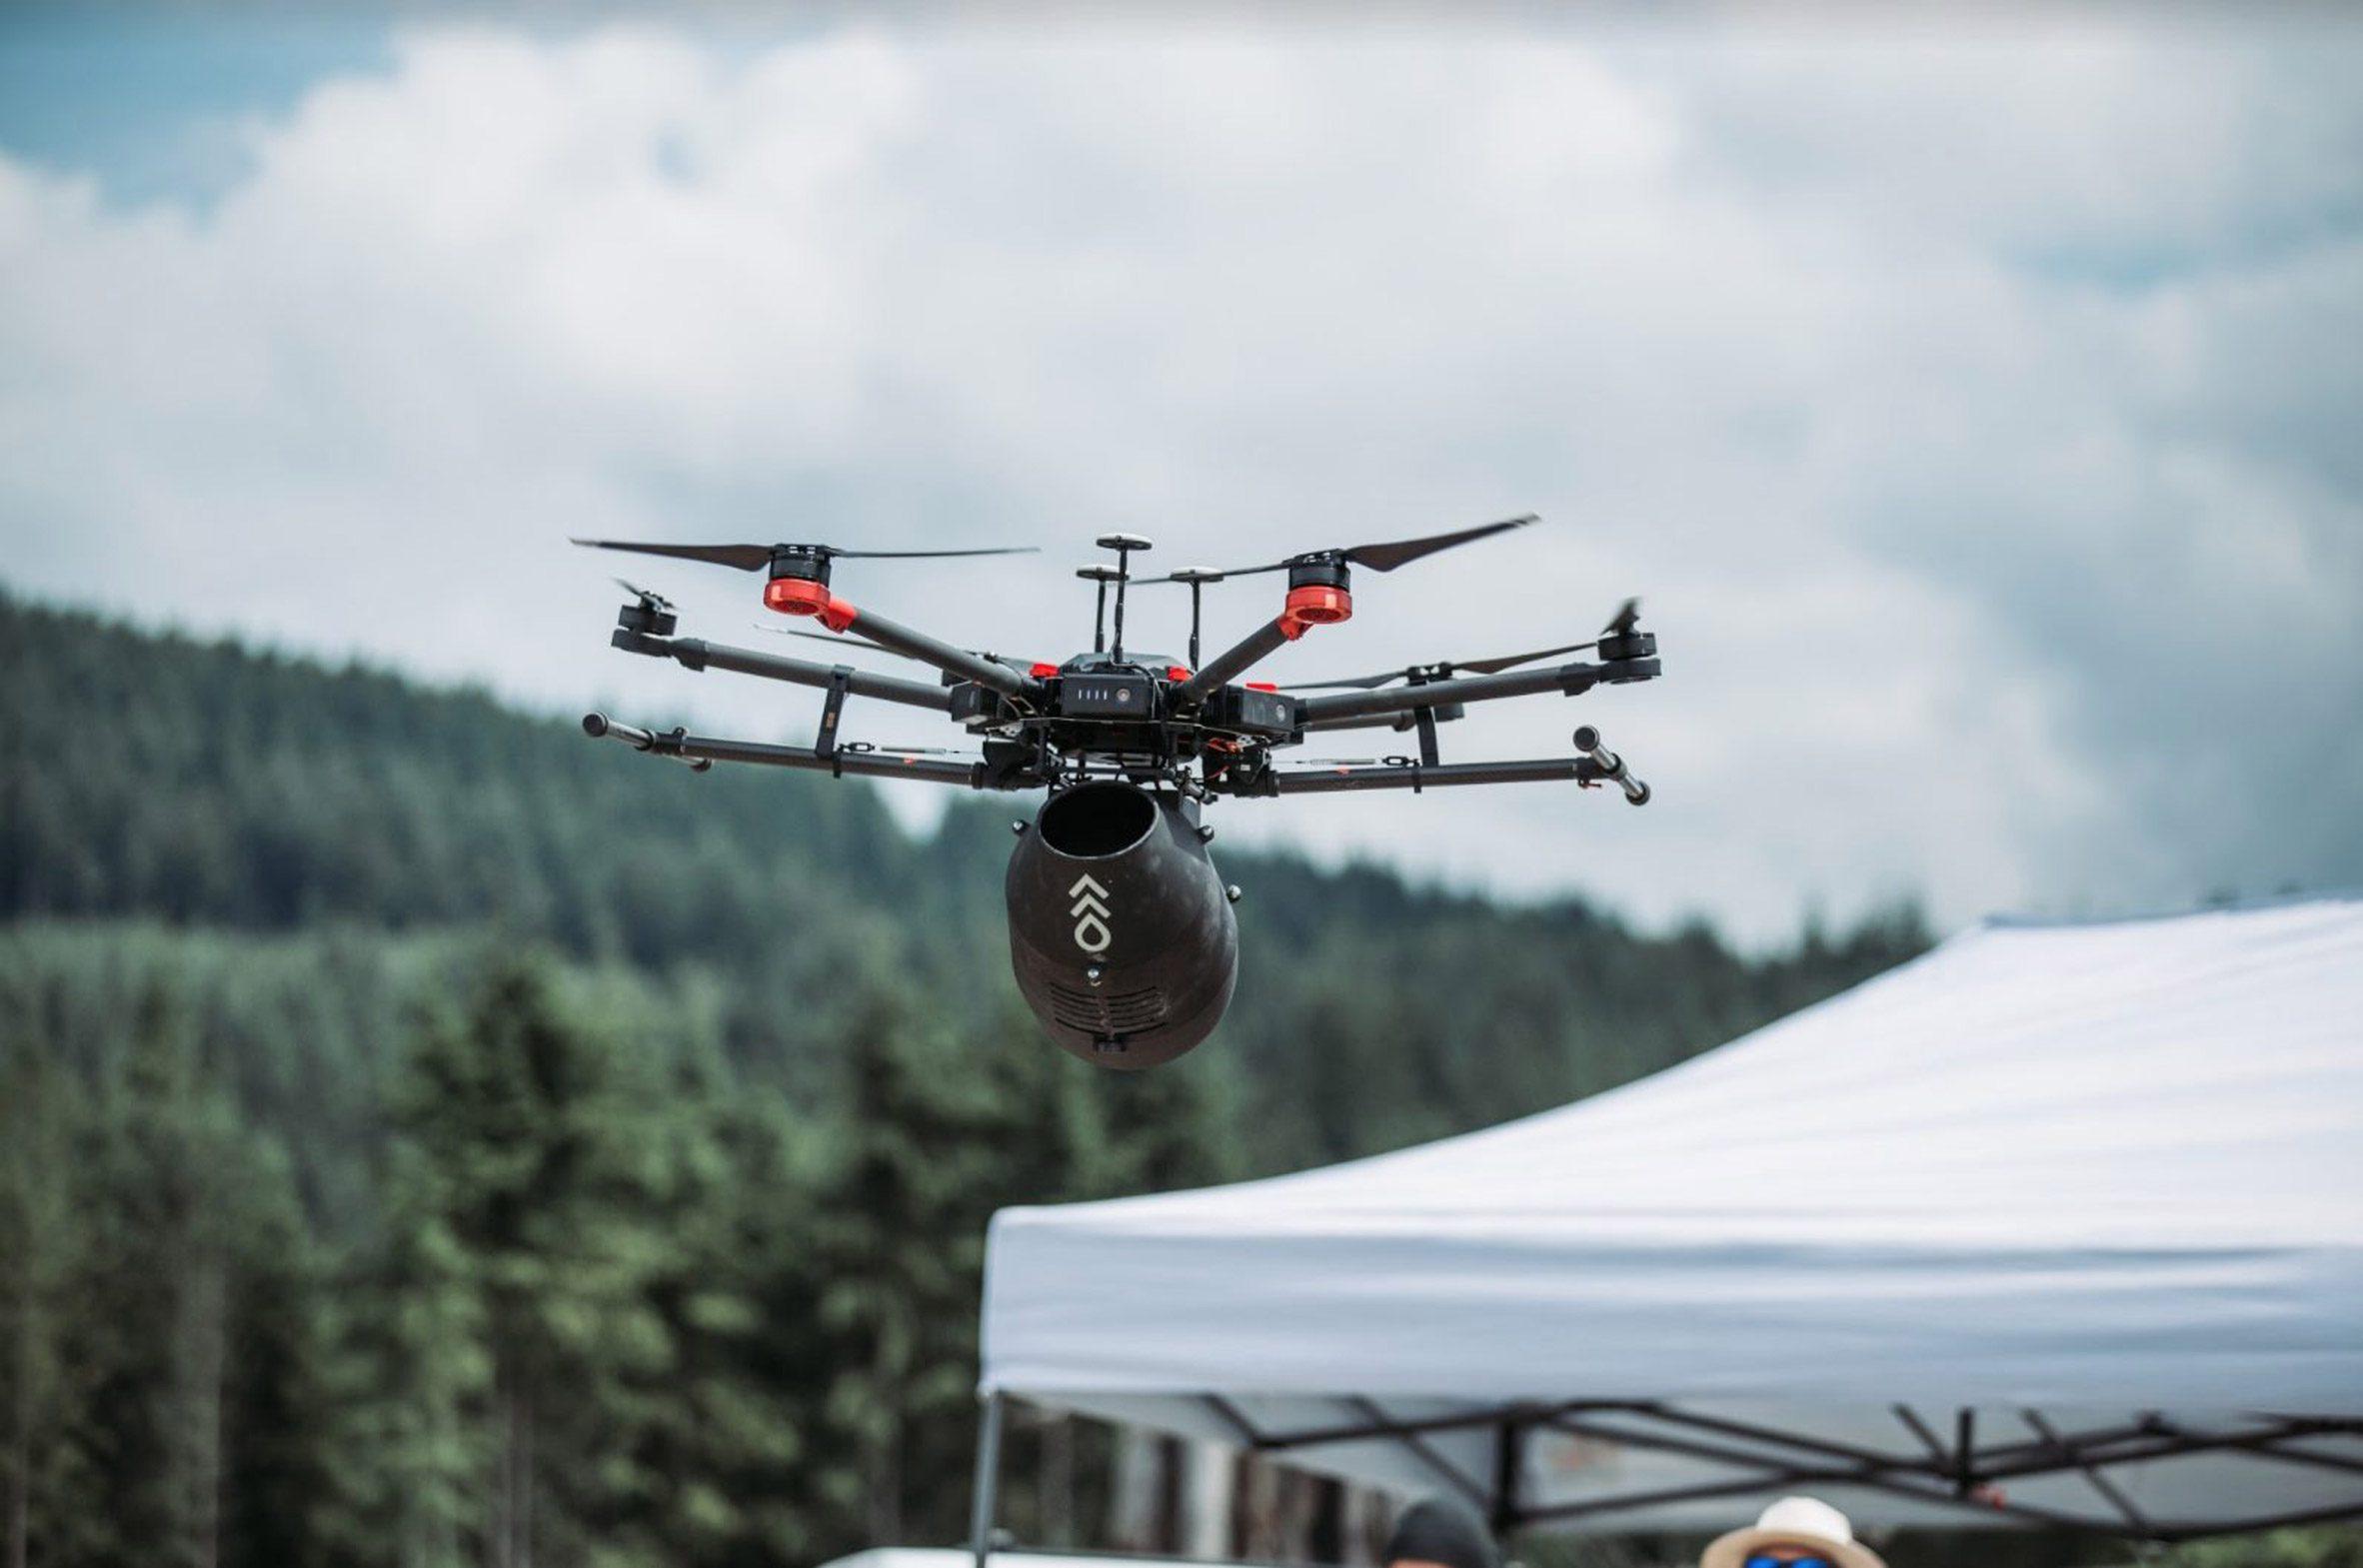 A drone flying above a gazebo